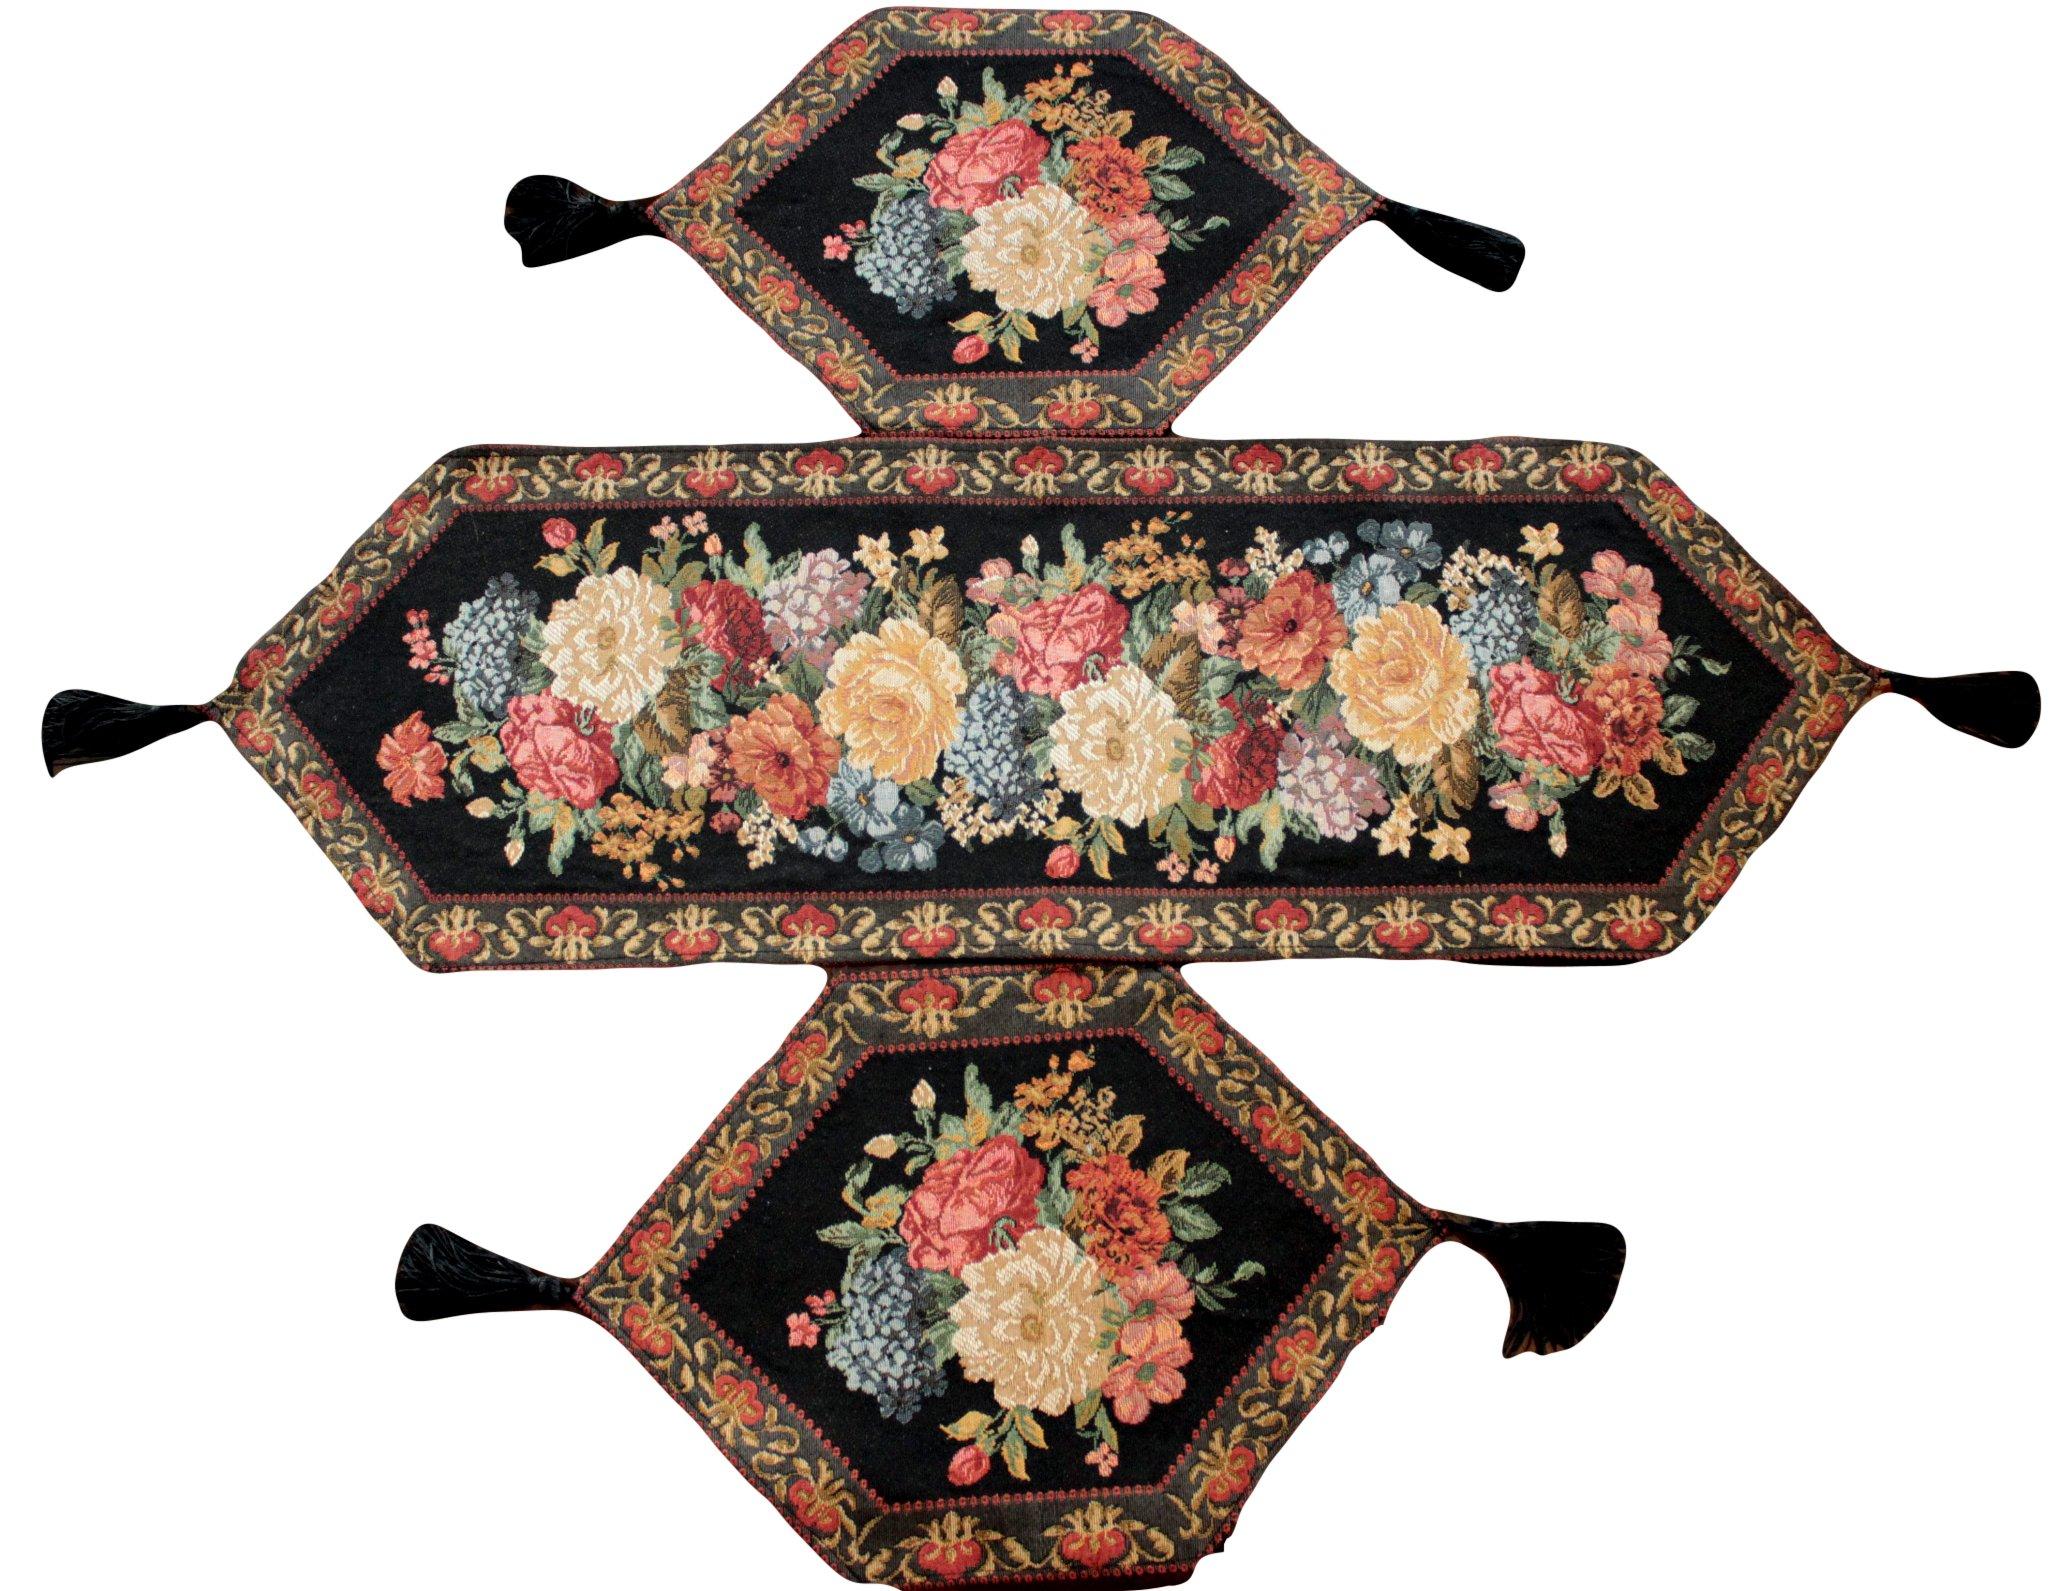 Tache 3 Piece Black Floral Woven Tapestry Midnight Awakenings Table Runner Set